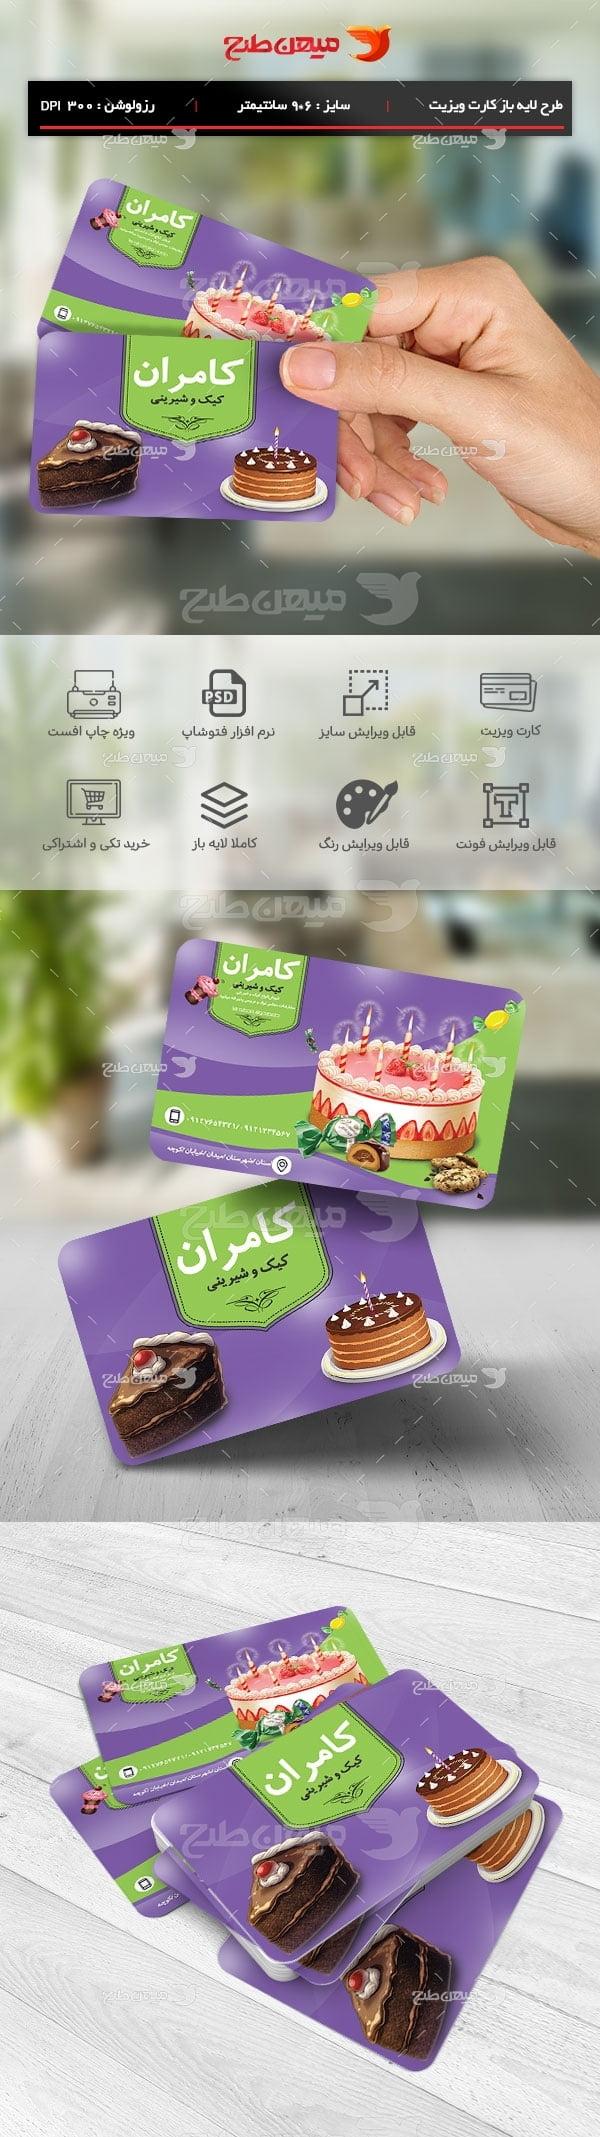 طرح لایه باز کارت ویزیت کیک و شیرینی